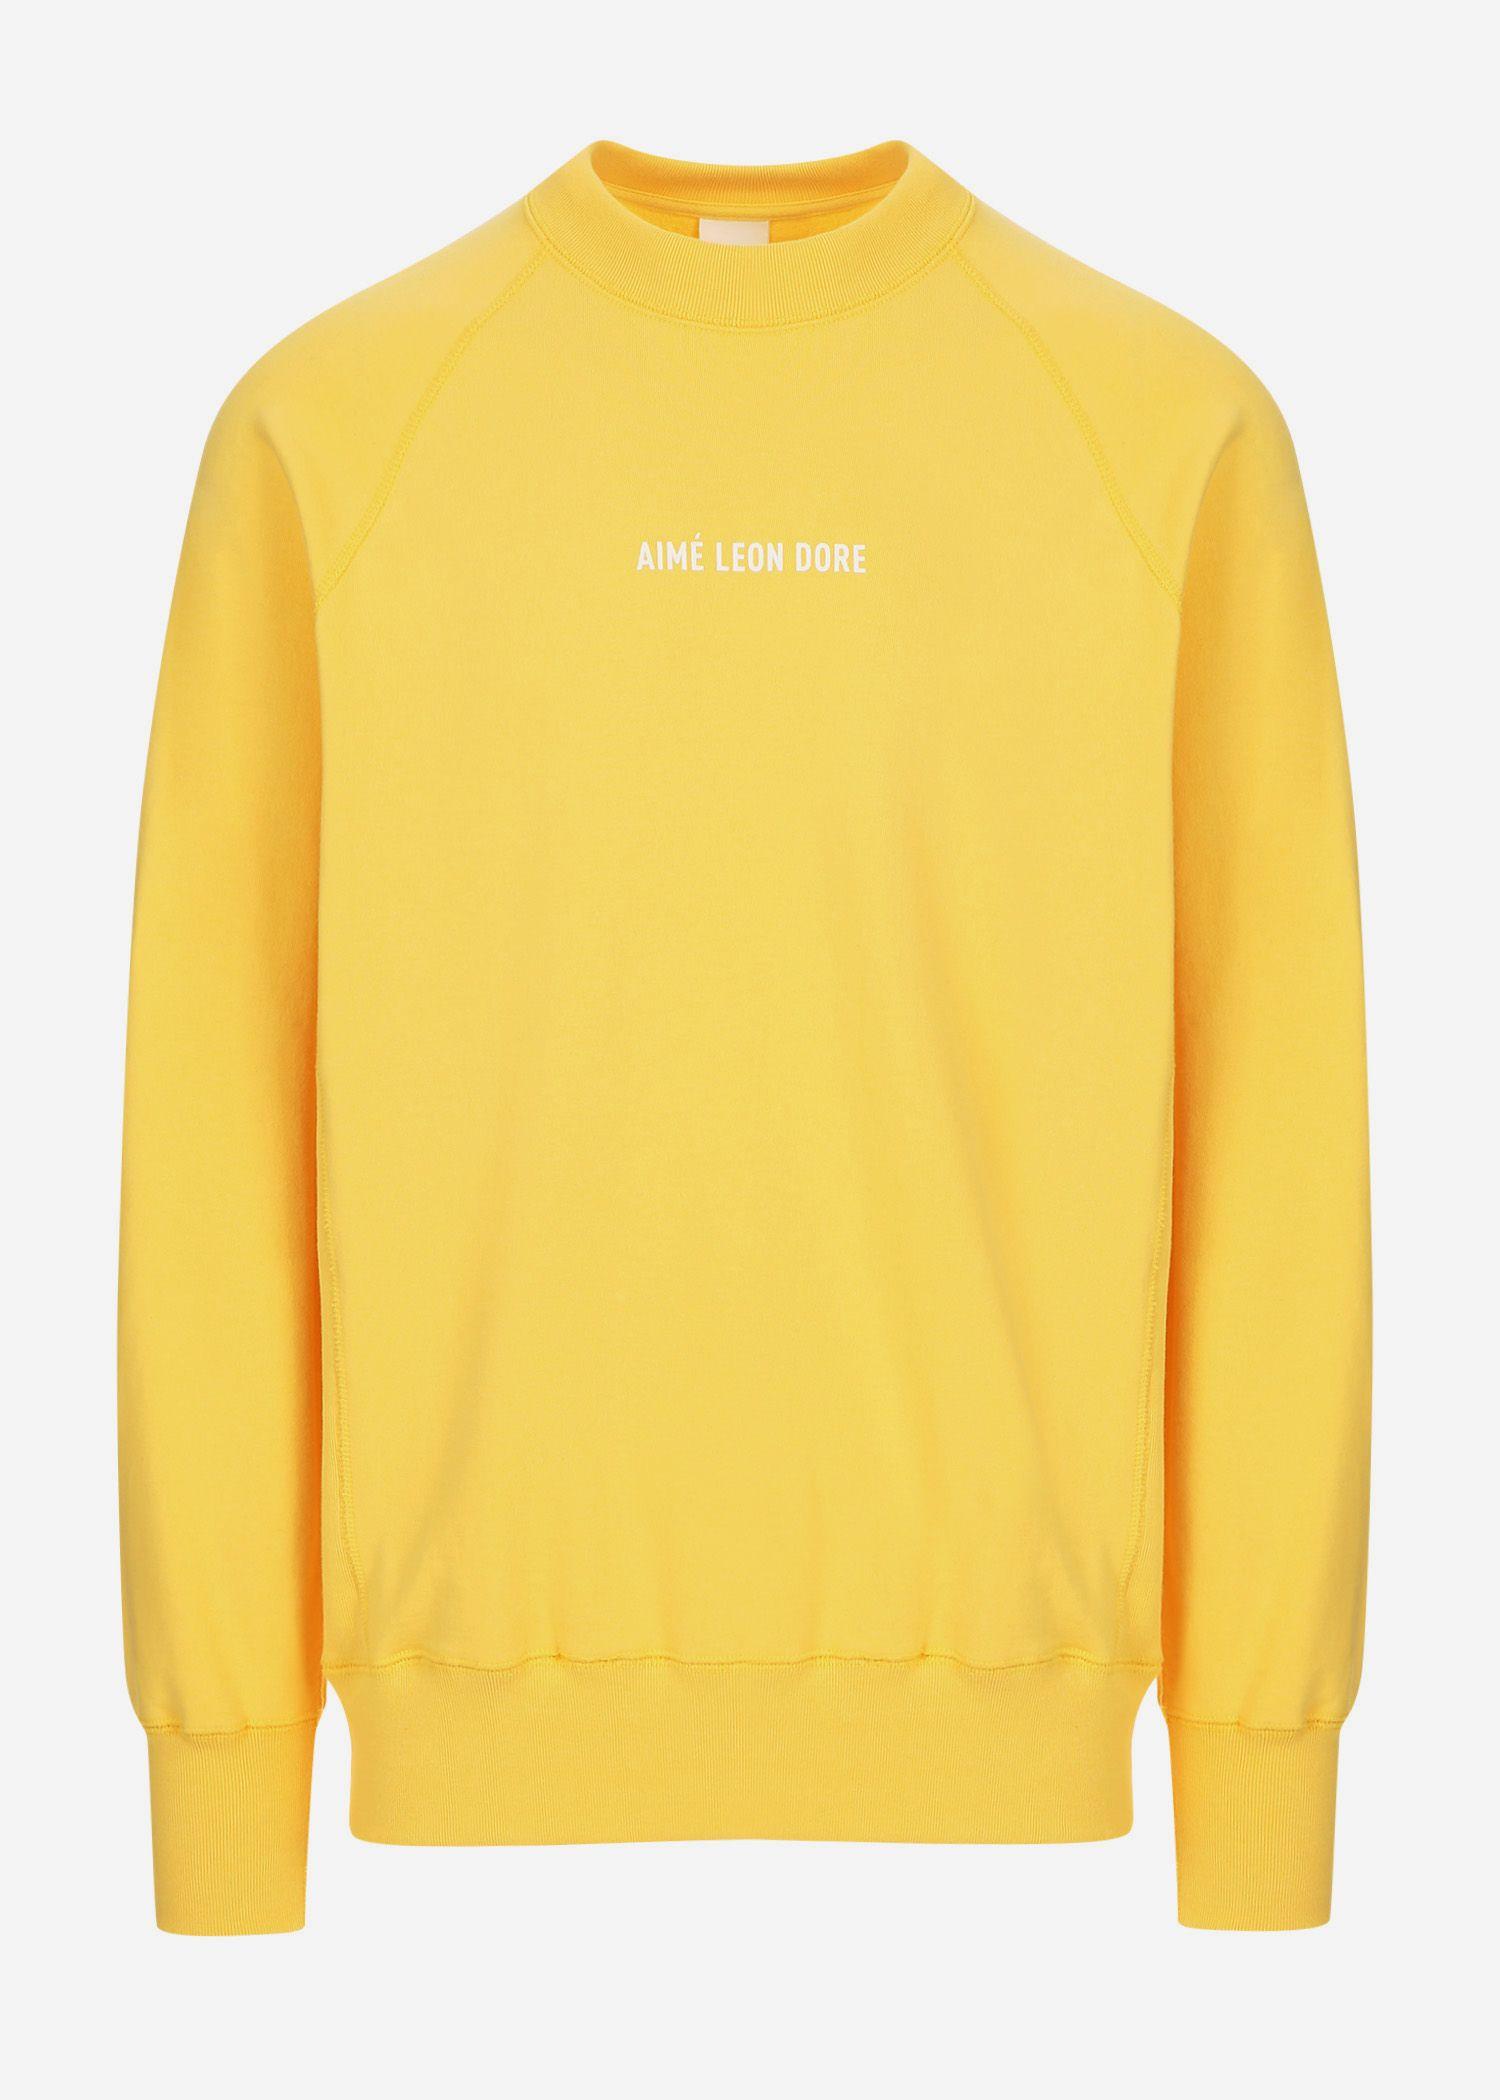 Aime Leon Dore Logo Crewneck Sweatshirt In Yellow Modesens Sweatshirts Crew Neck Sweatshirt Long Sleeve Sweatshirts [ 2100 x 1500 Pixel ]